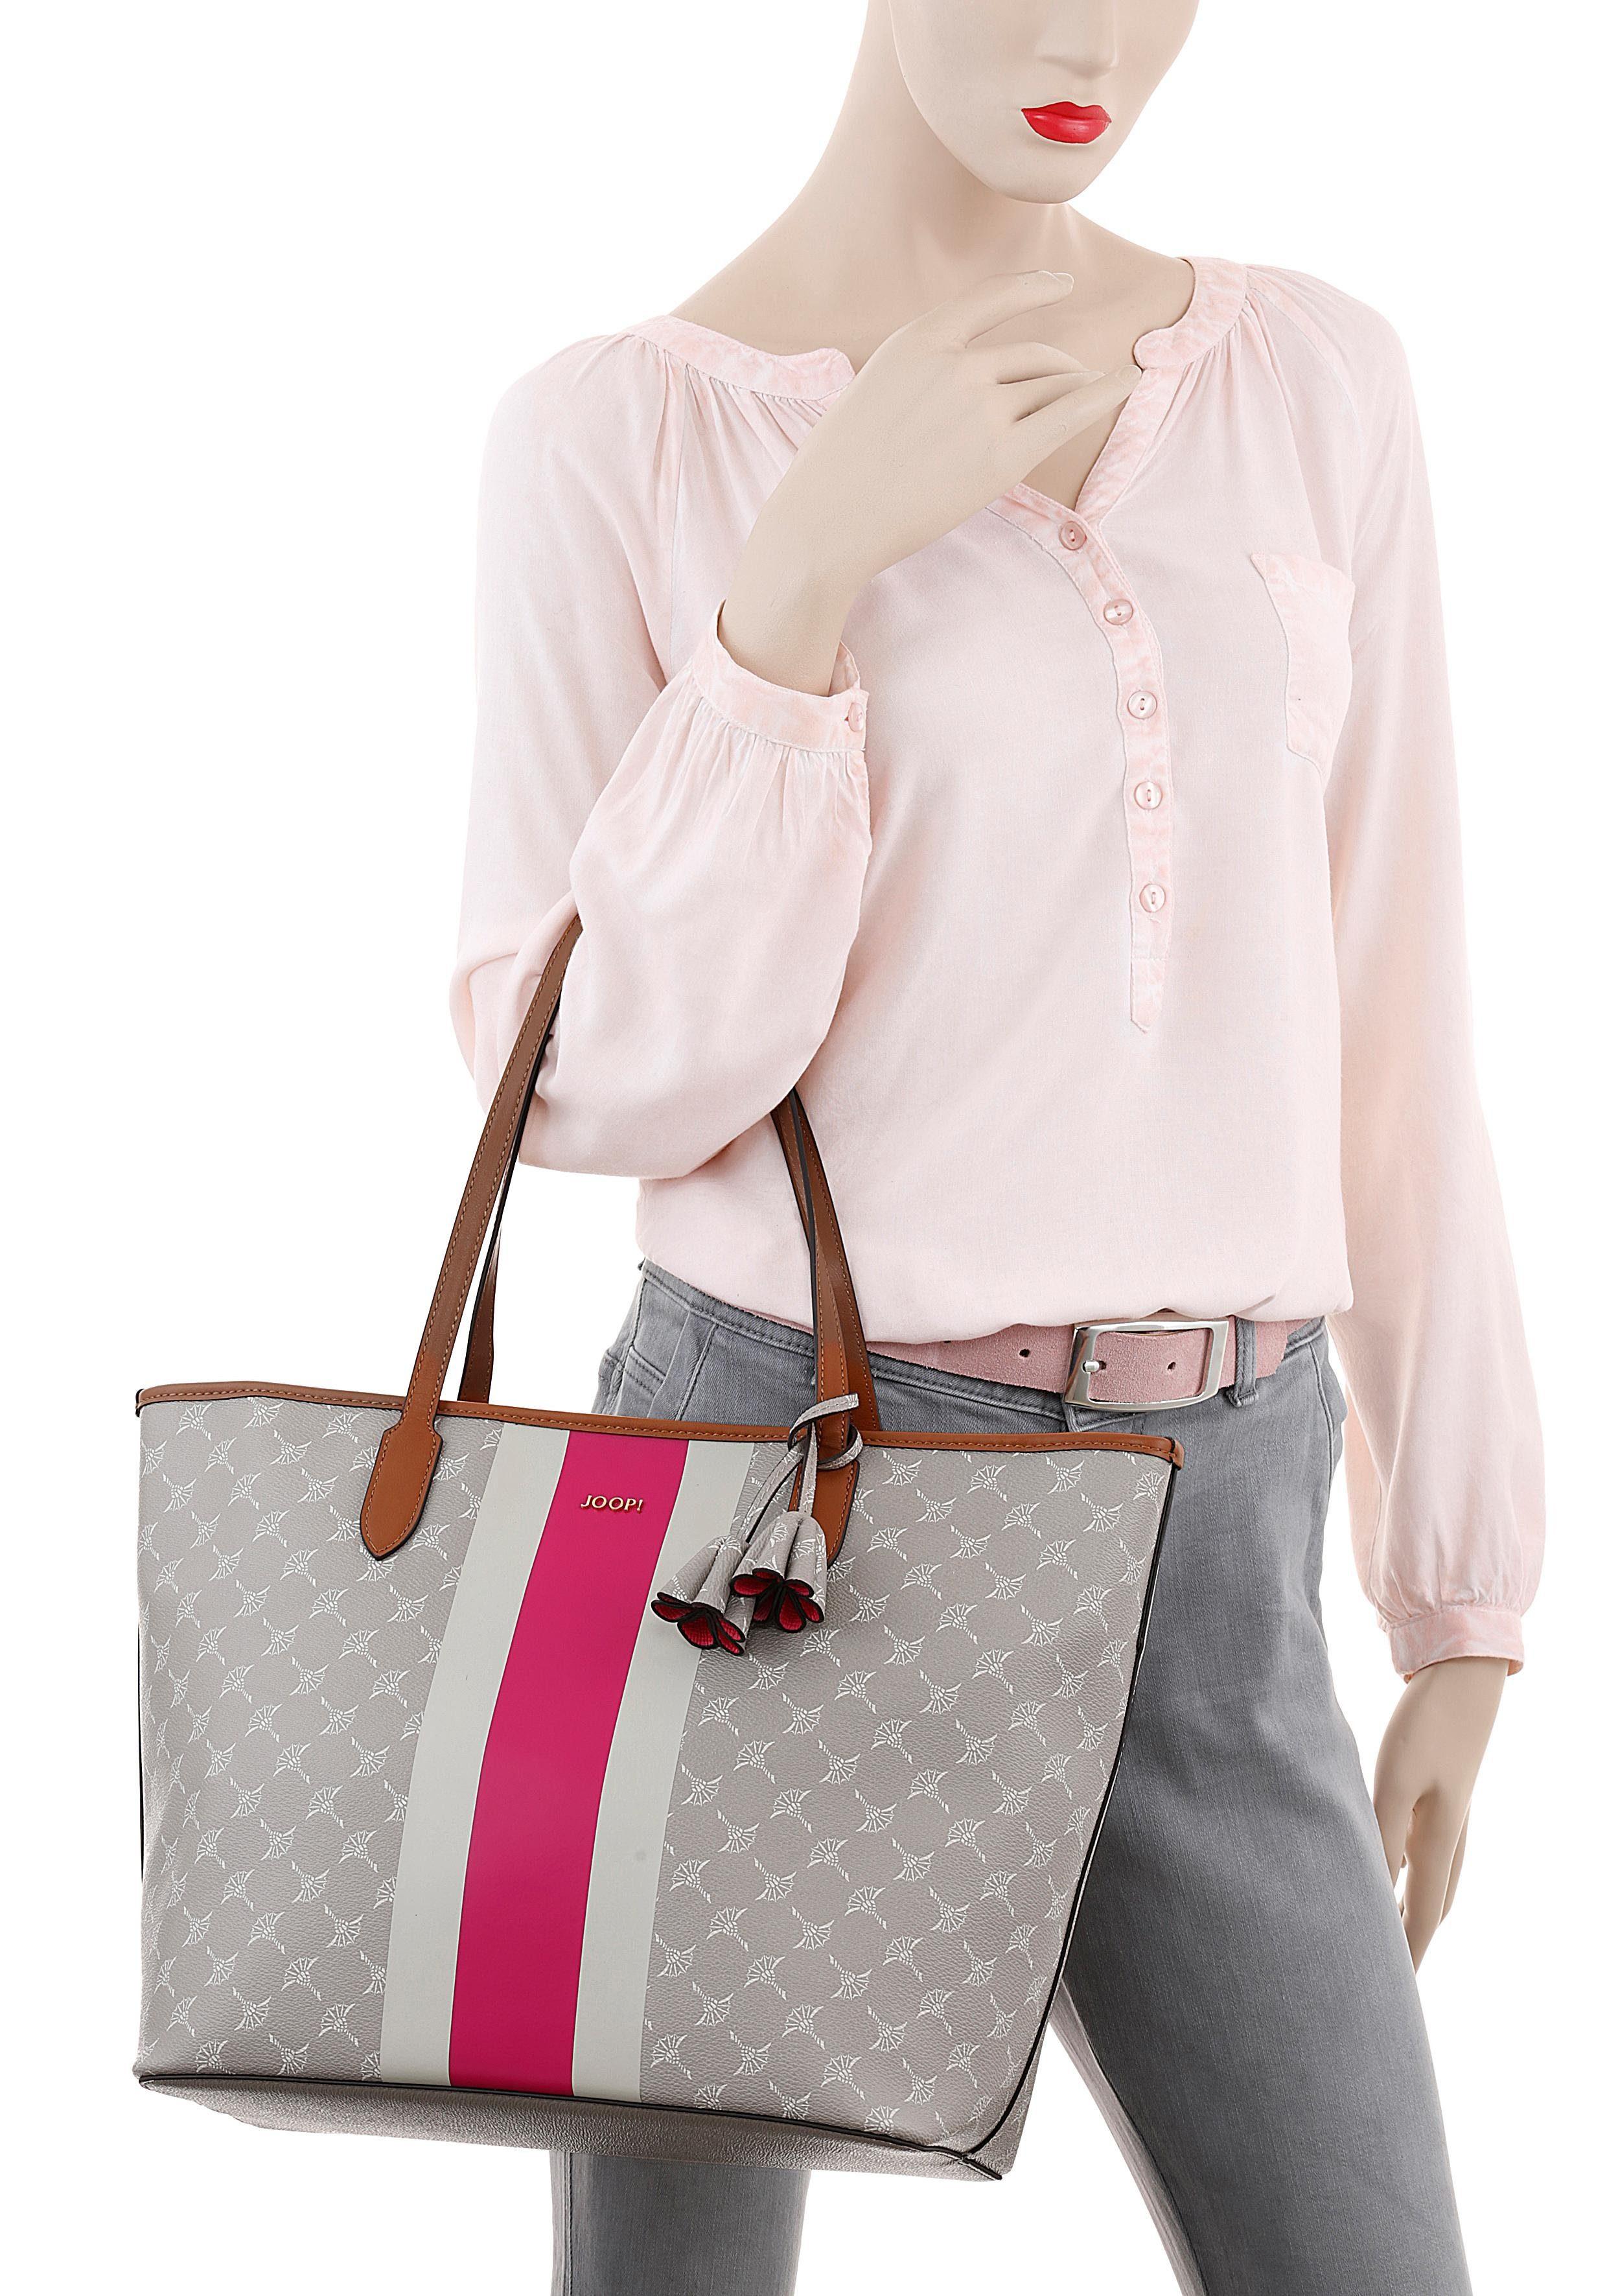 Lara« Mit Due Herausnehmbarer Shopper Joop »cortina Kosmetiktasche IwOqt0R